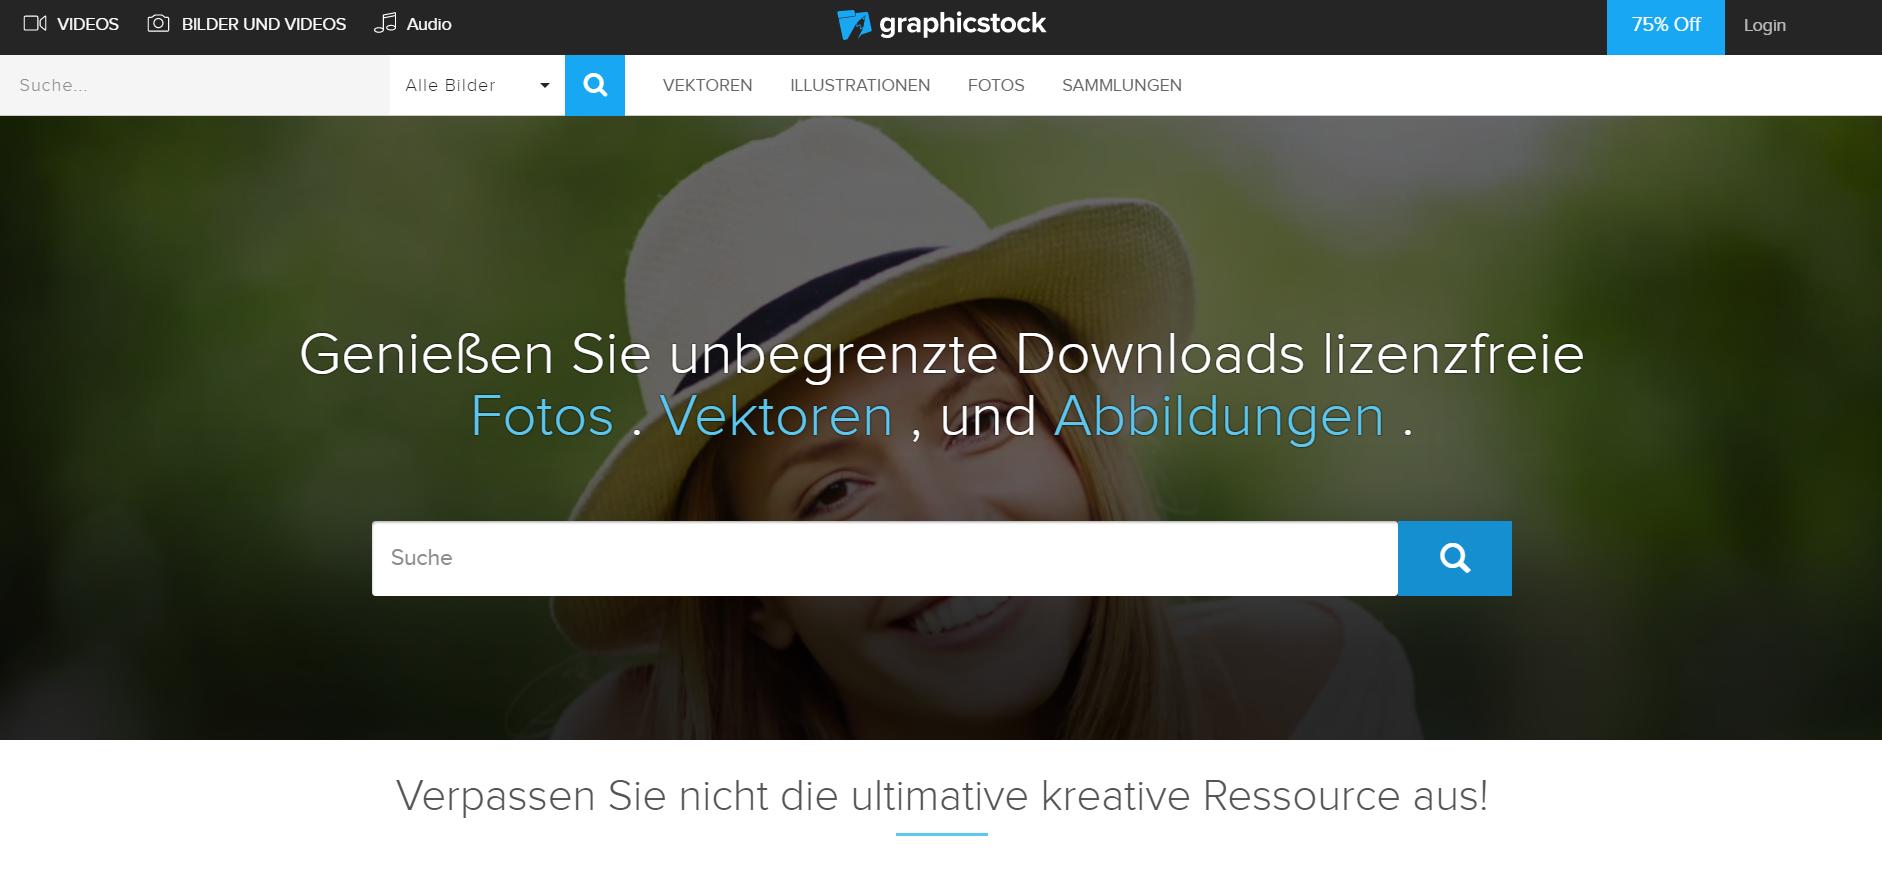 Graphicstock – Lizenzfreie Stockfotografie